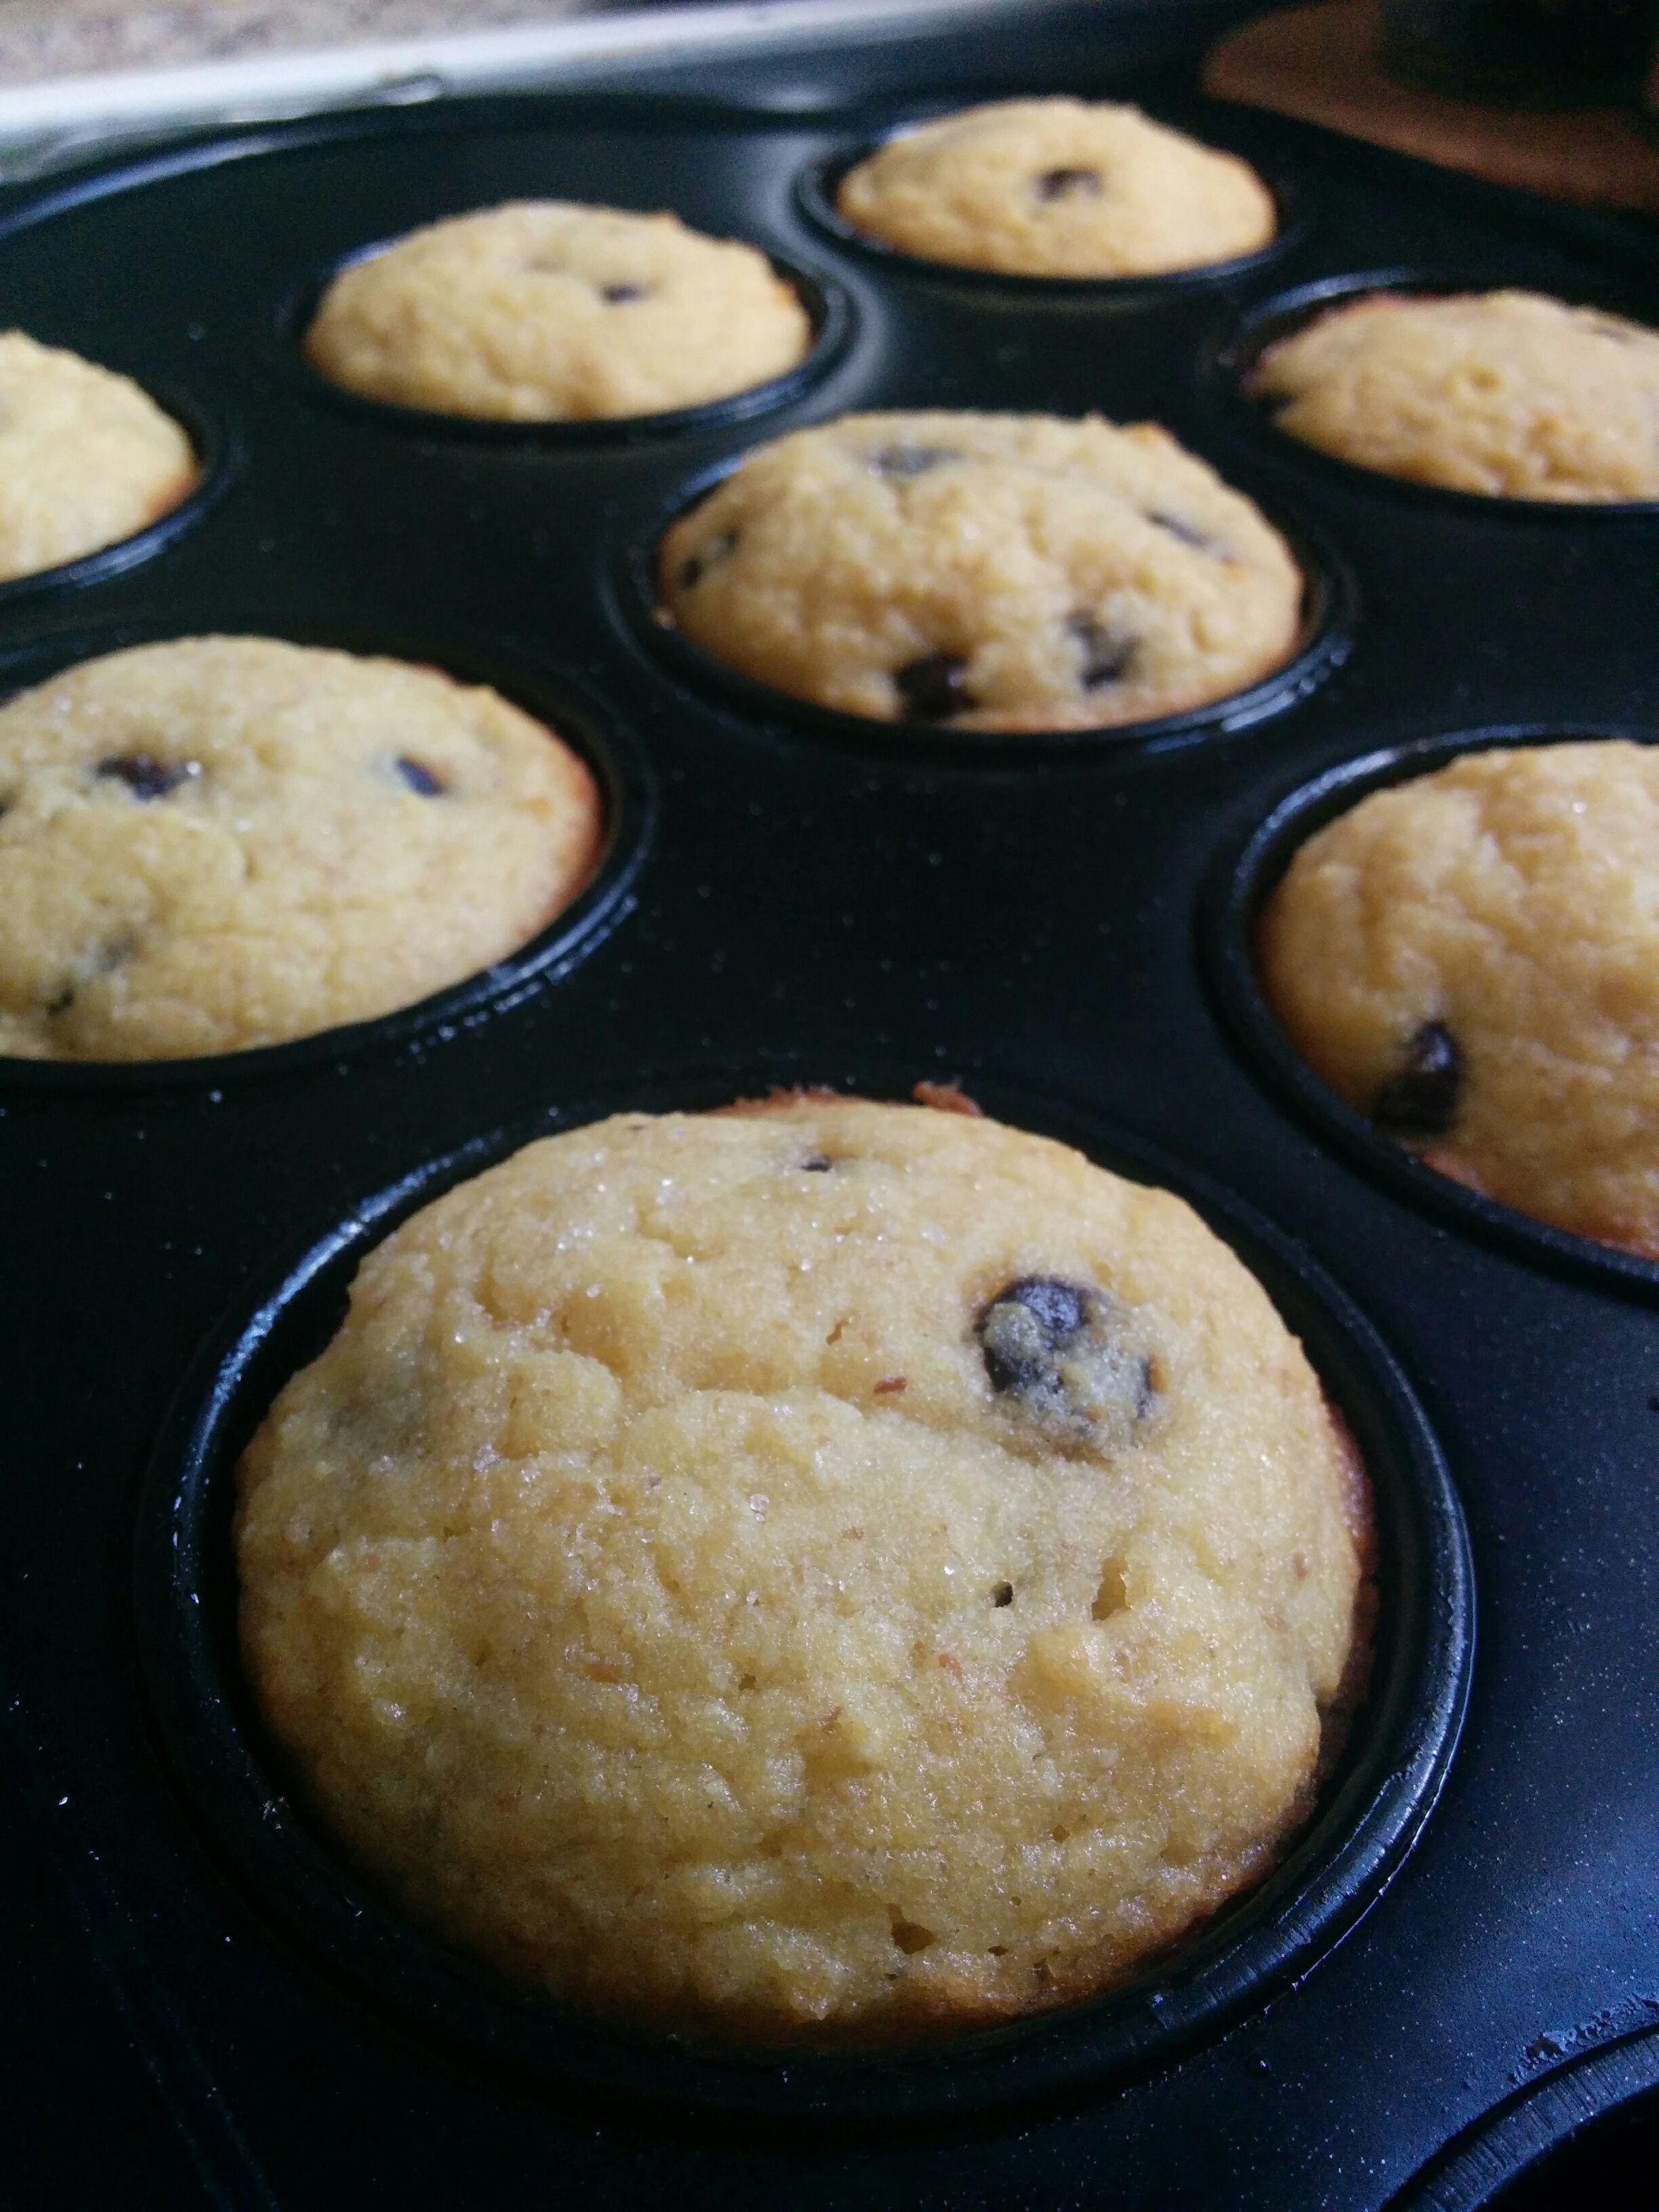 Chocolate chip muffins thm s choc chip muffins low